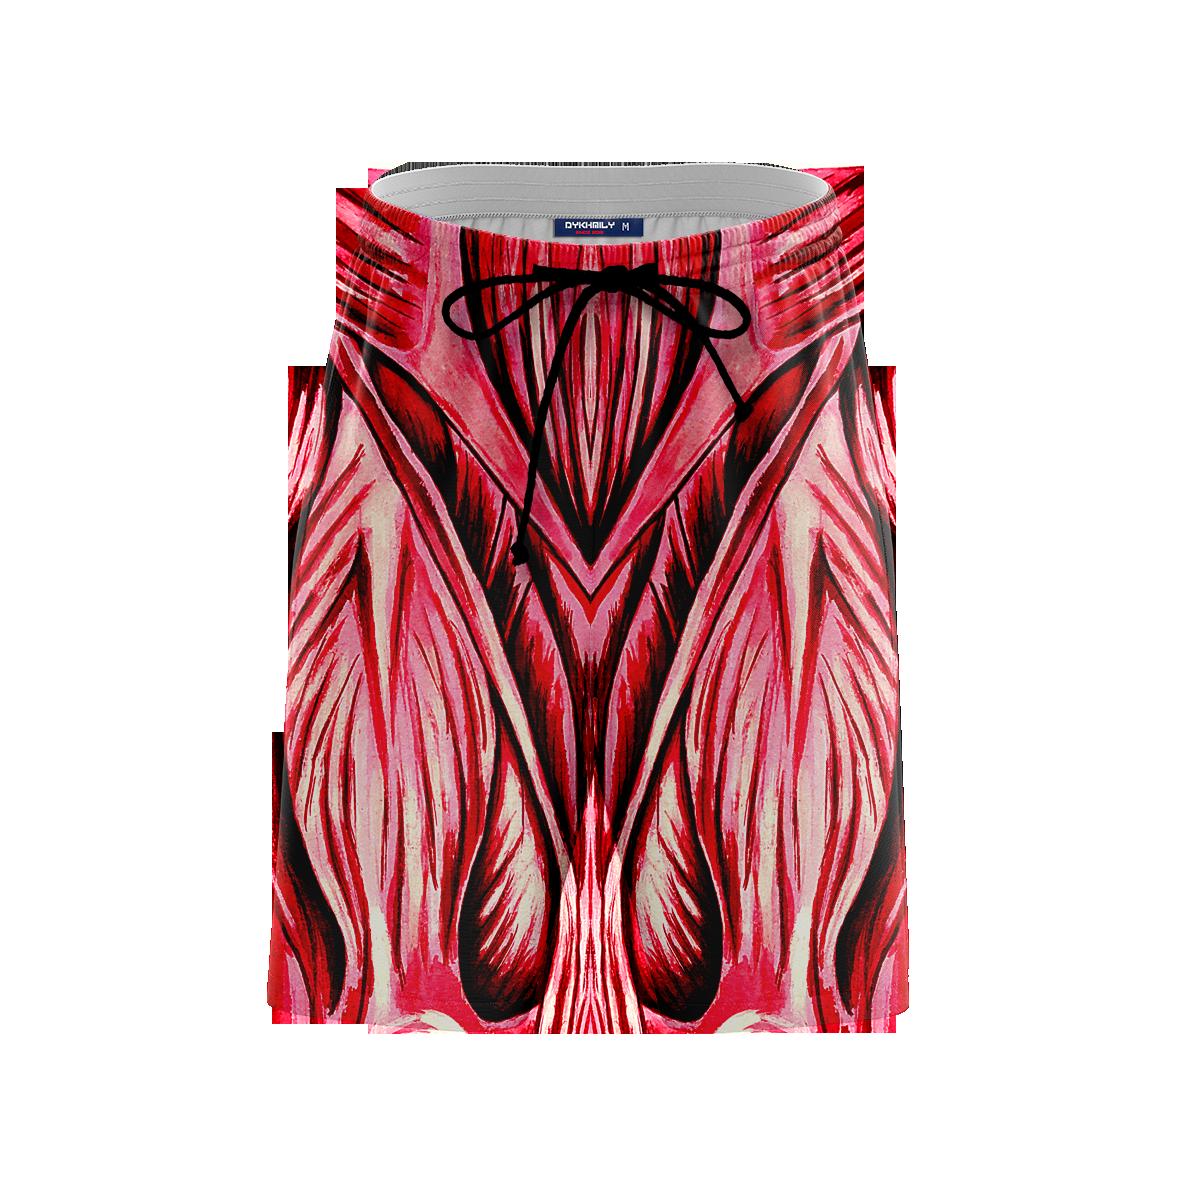 Colossal Titan Beach Shorts FDM3107 S Official Anime Swimsuit Merch